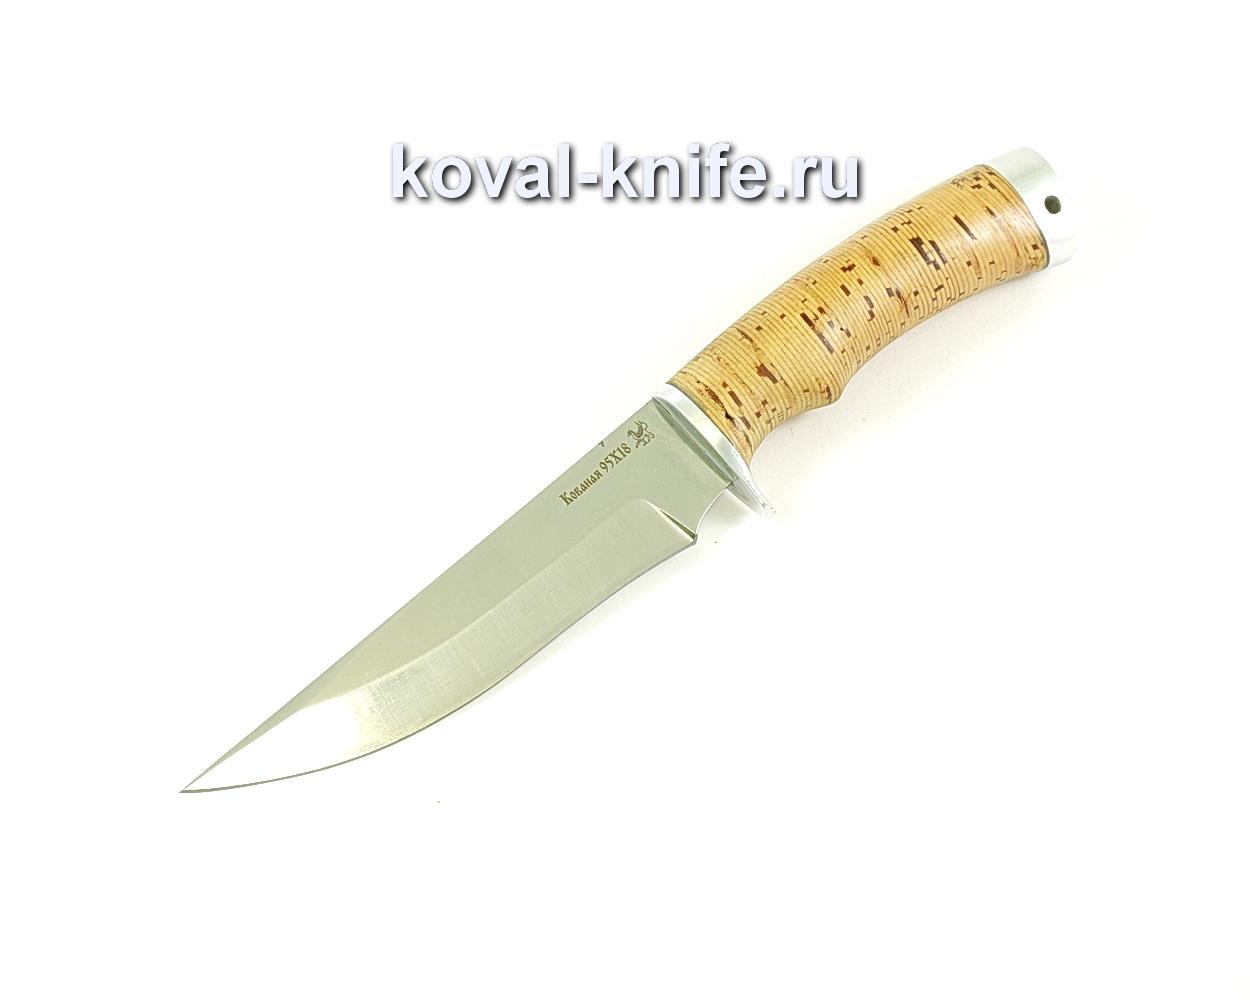 Нож Лис (сталь 95х18), рукоять береста A266